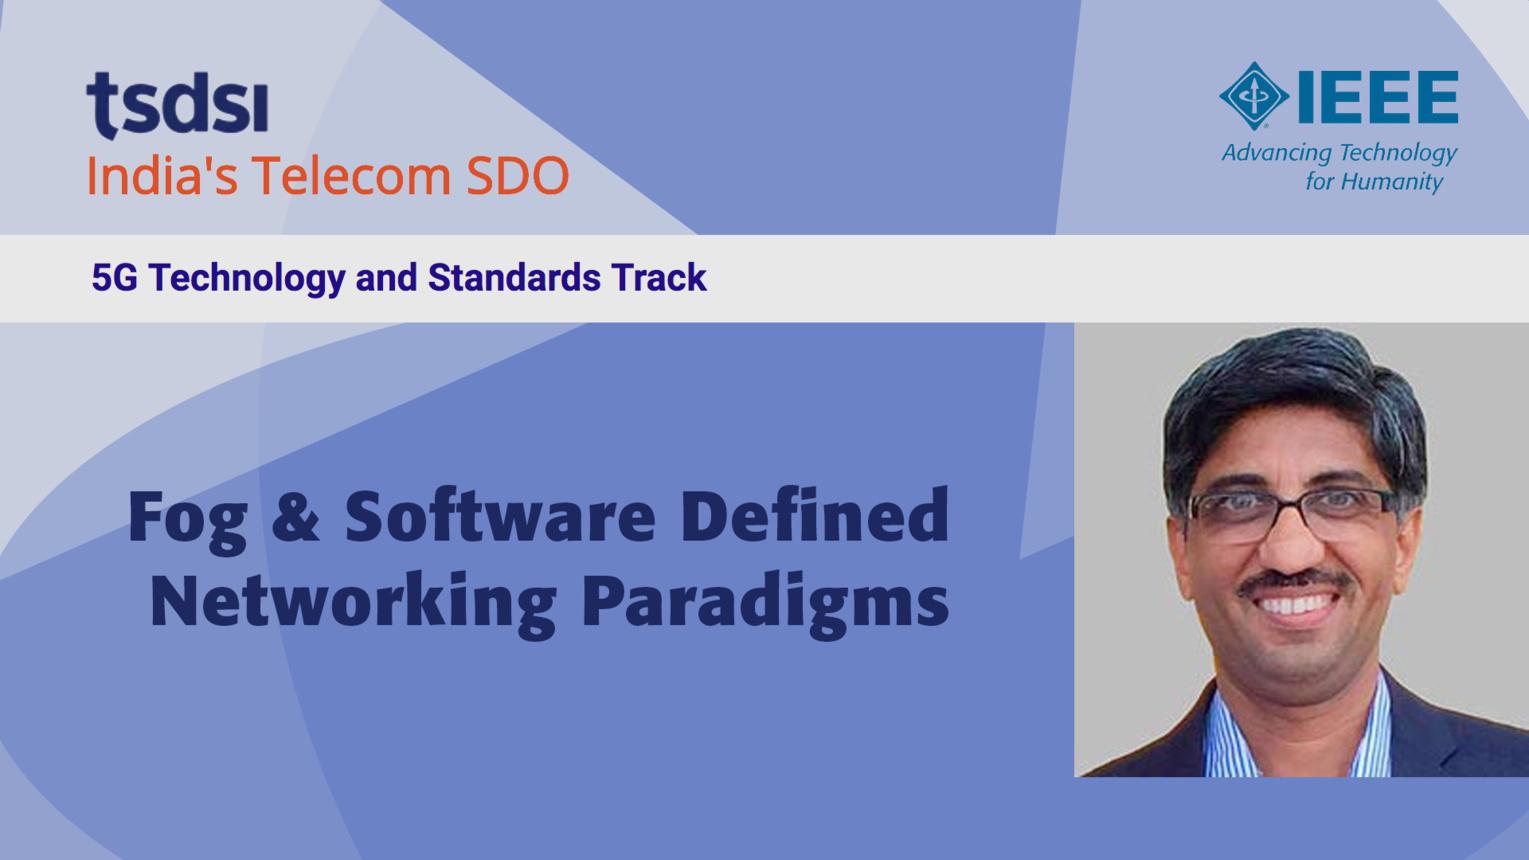 Keynote 3: Fog and Software Defined Networking Paradigms - Abhay Karandikar - India Mobile Congress, 2018